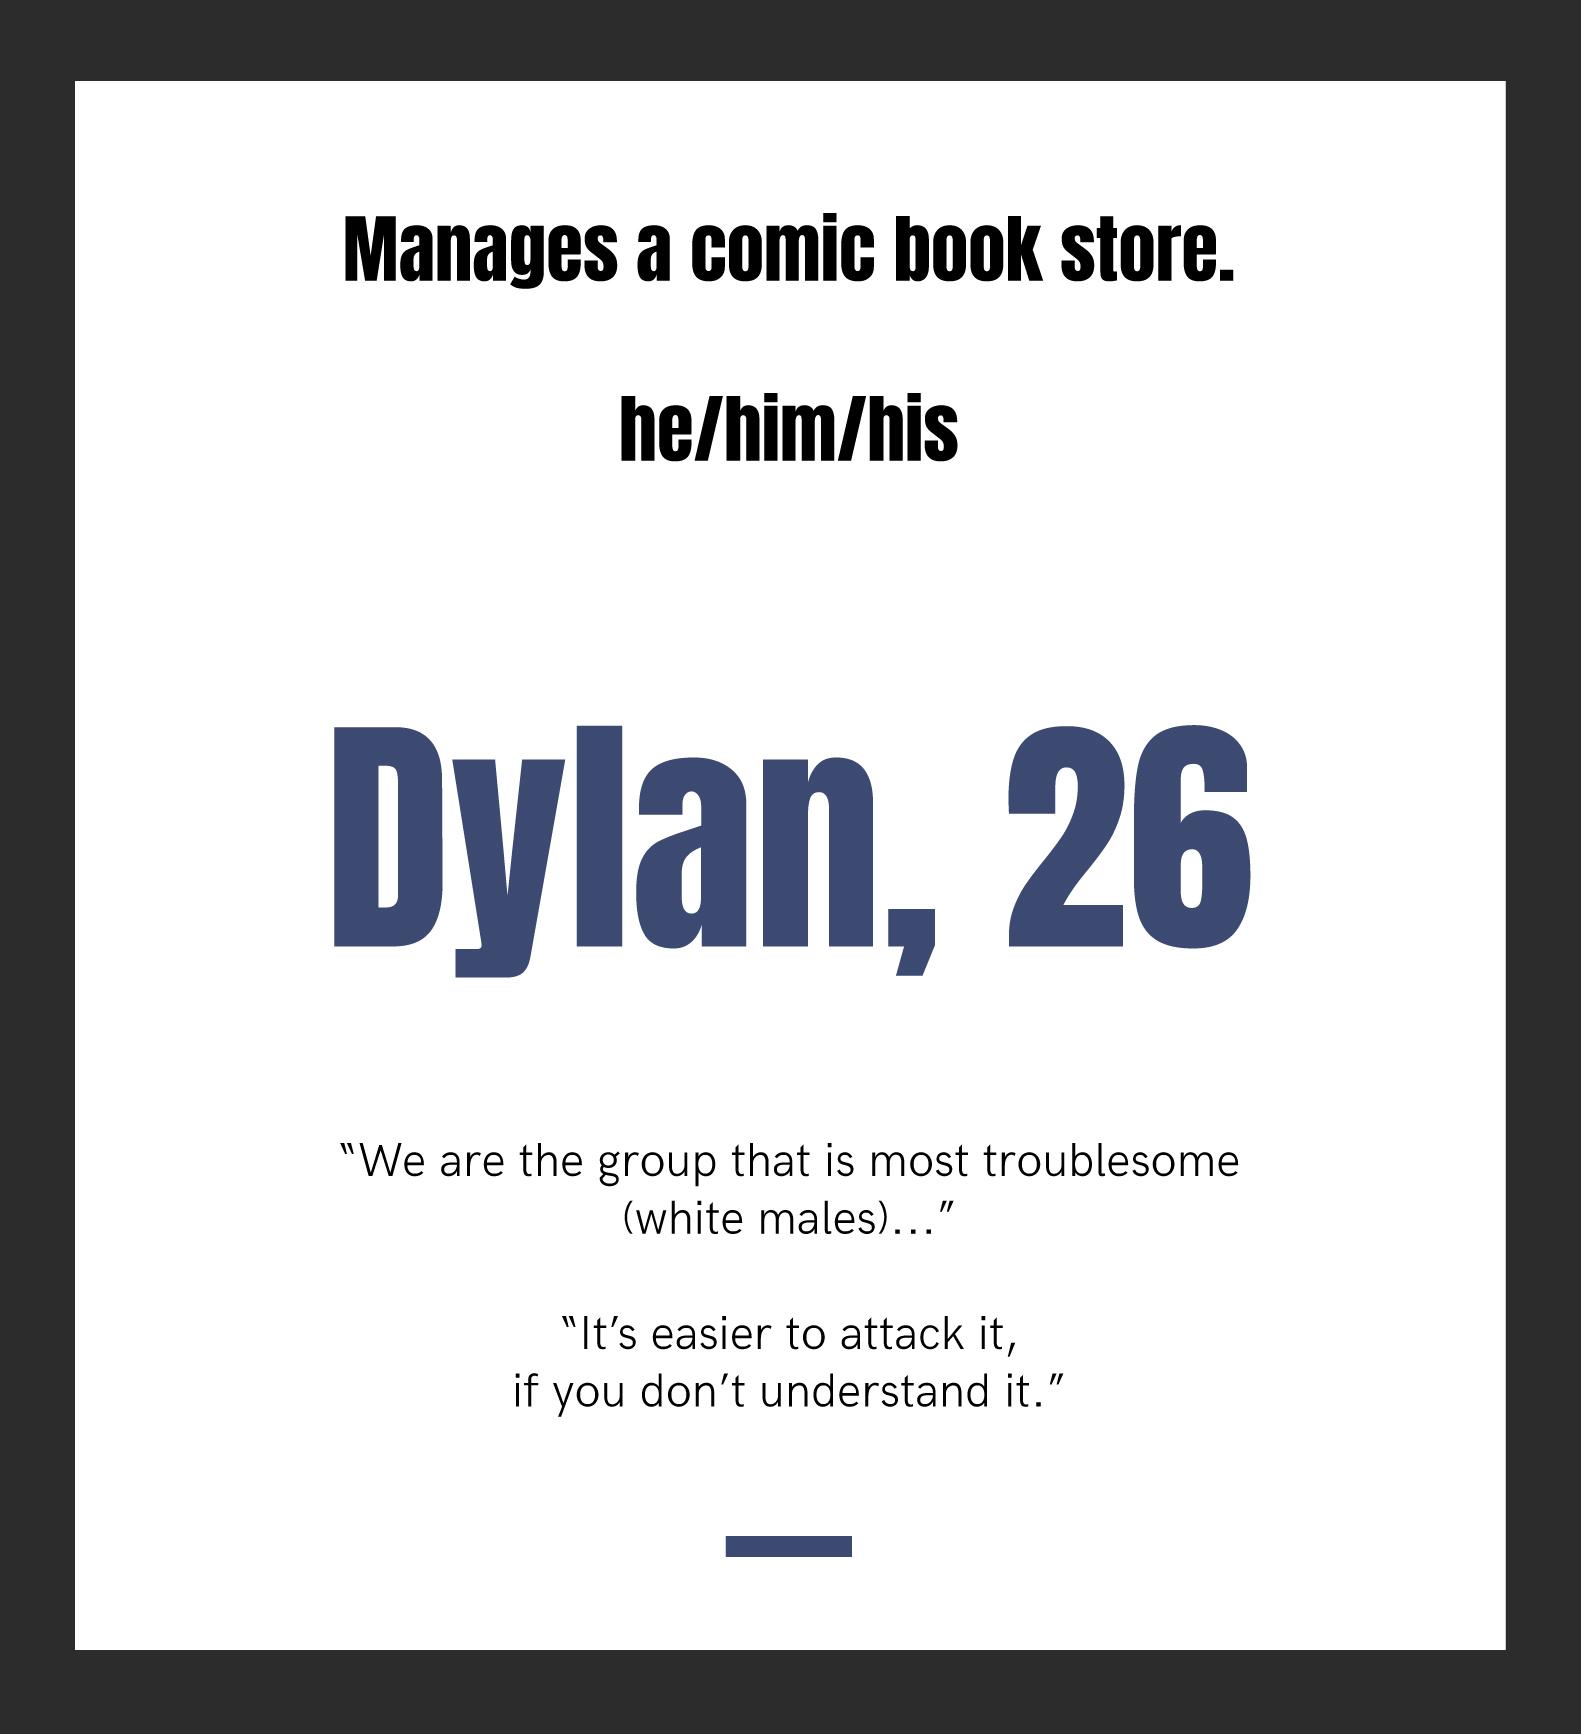 Dylan, 26